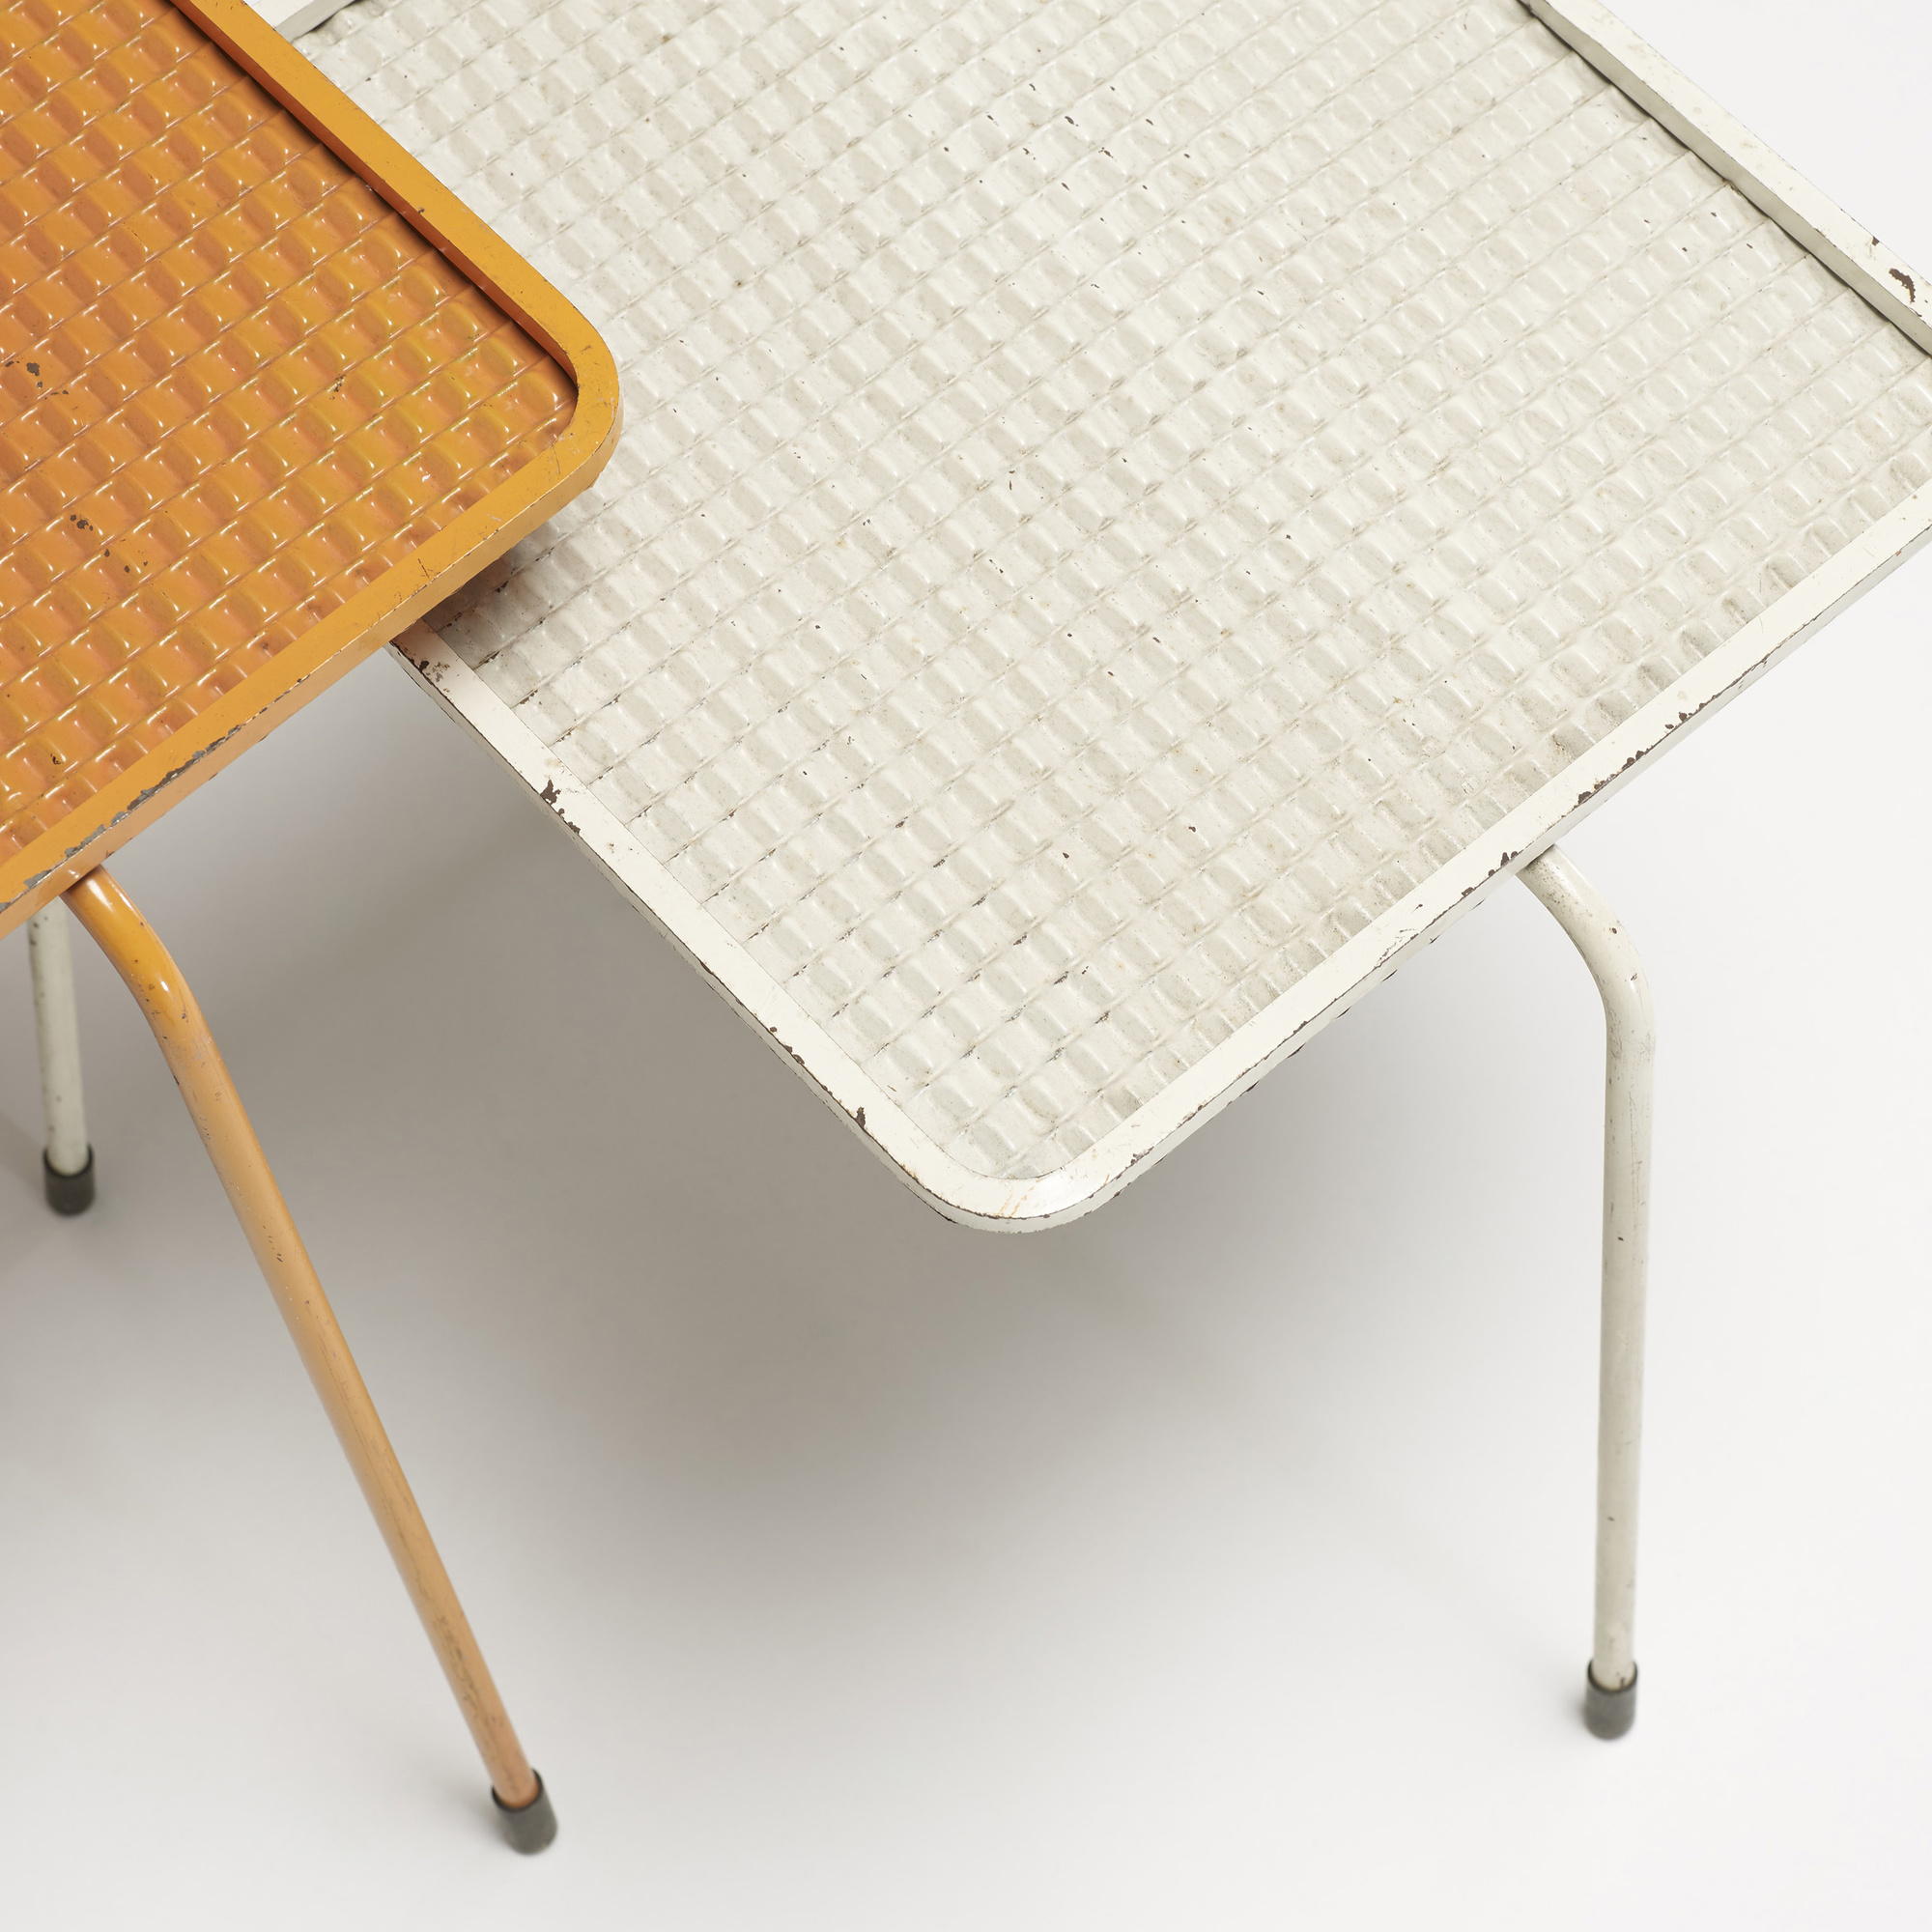 340 mathieu mat got soumba nesting tables set of three. Black Bedroom Furniture Sets. Home Design Ideas